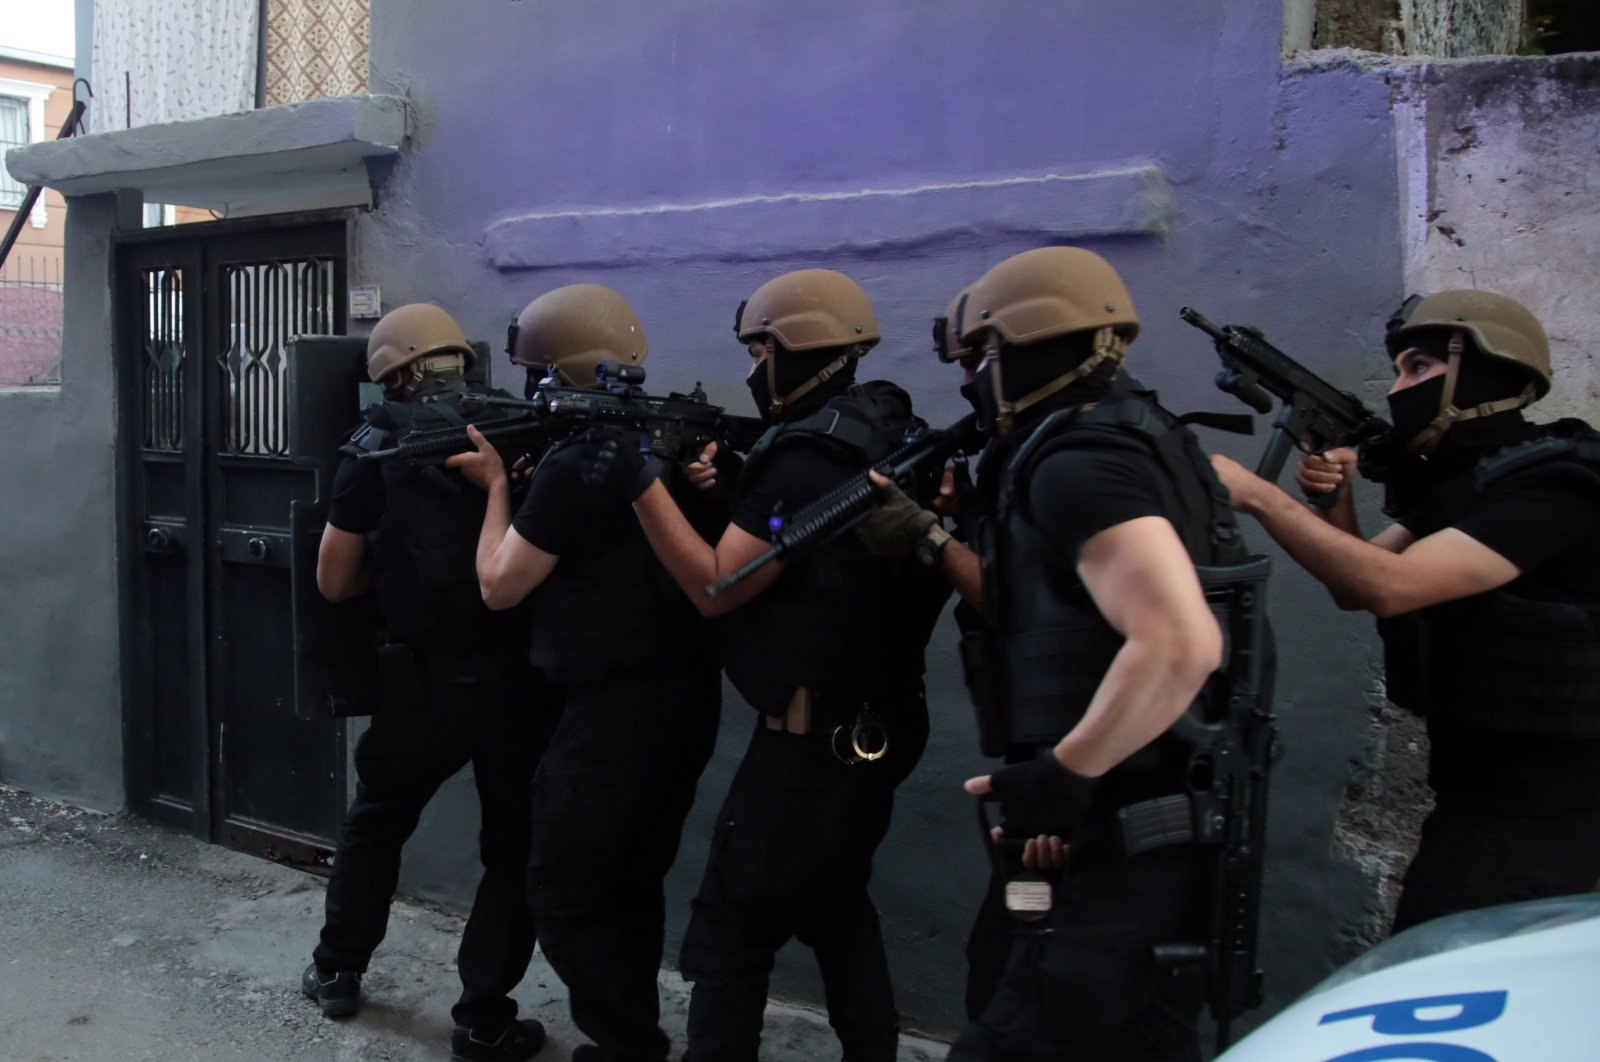 A counterterrorism squad prepares to raid the address of a suspected PKK terrorist in Turkey's southern Adana province, Monday, May 24, 2021. (AA Photo)